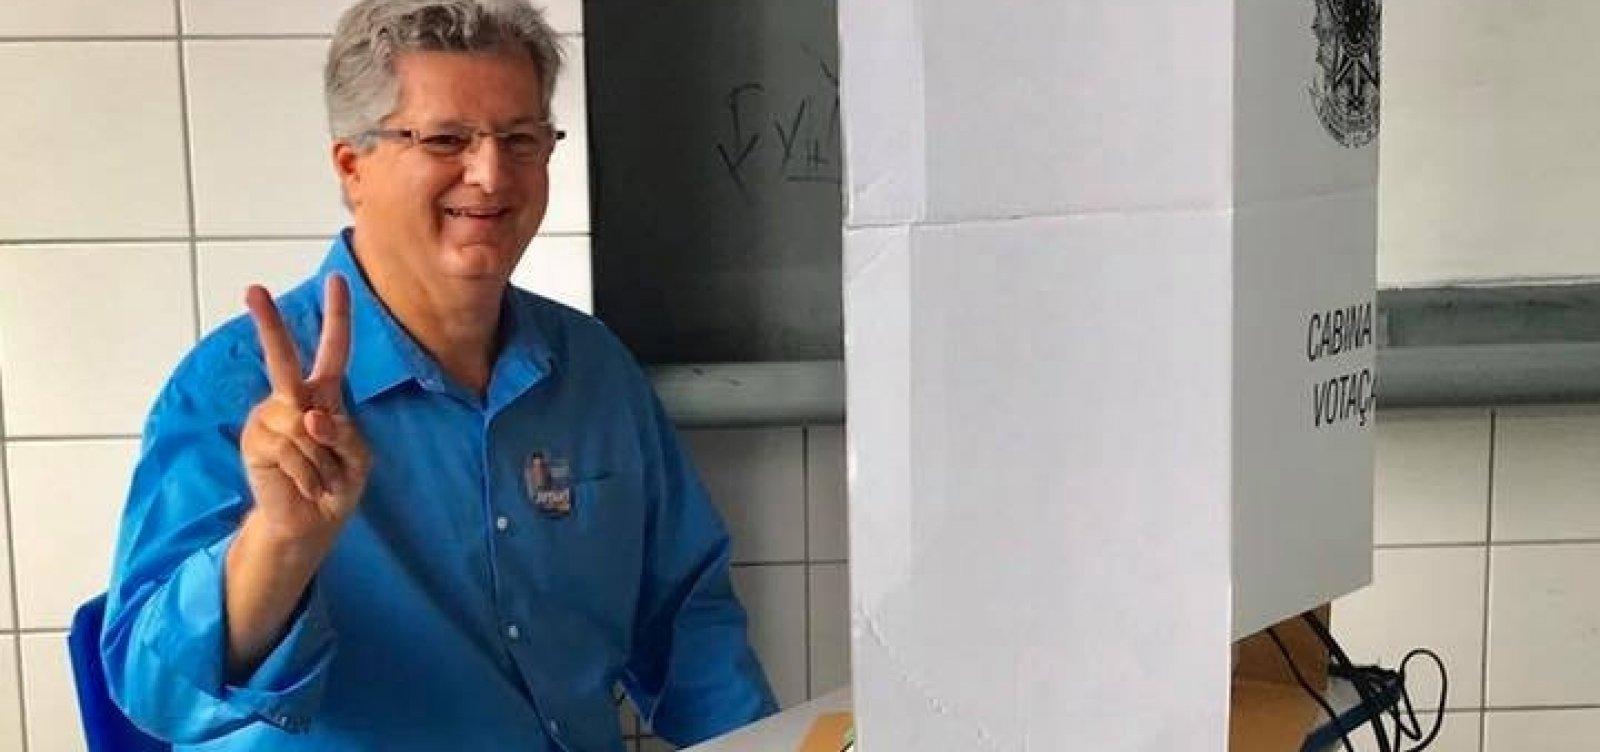 [Após derrota, Jutahy Magalhães Júnior decide deixar vida política]